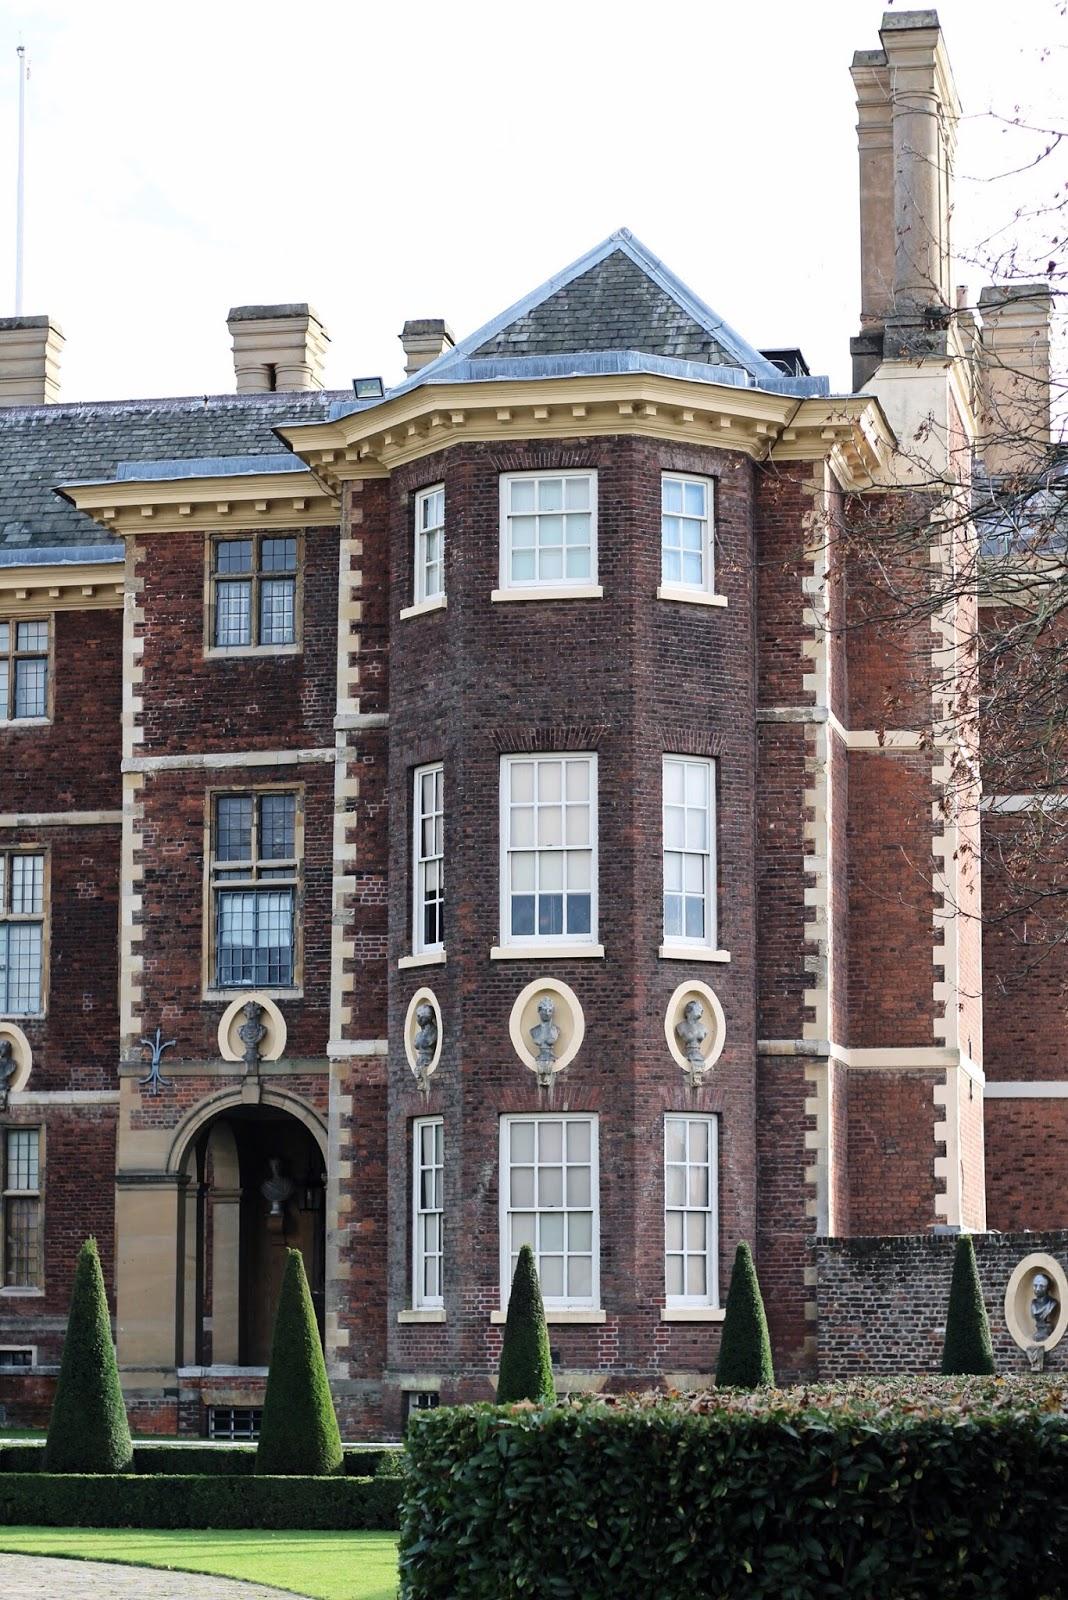 17th century Ham House building in Richmond London